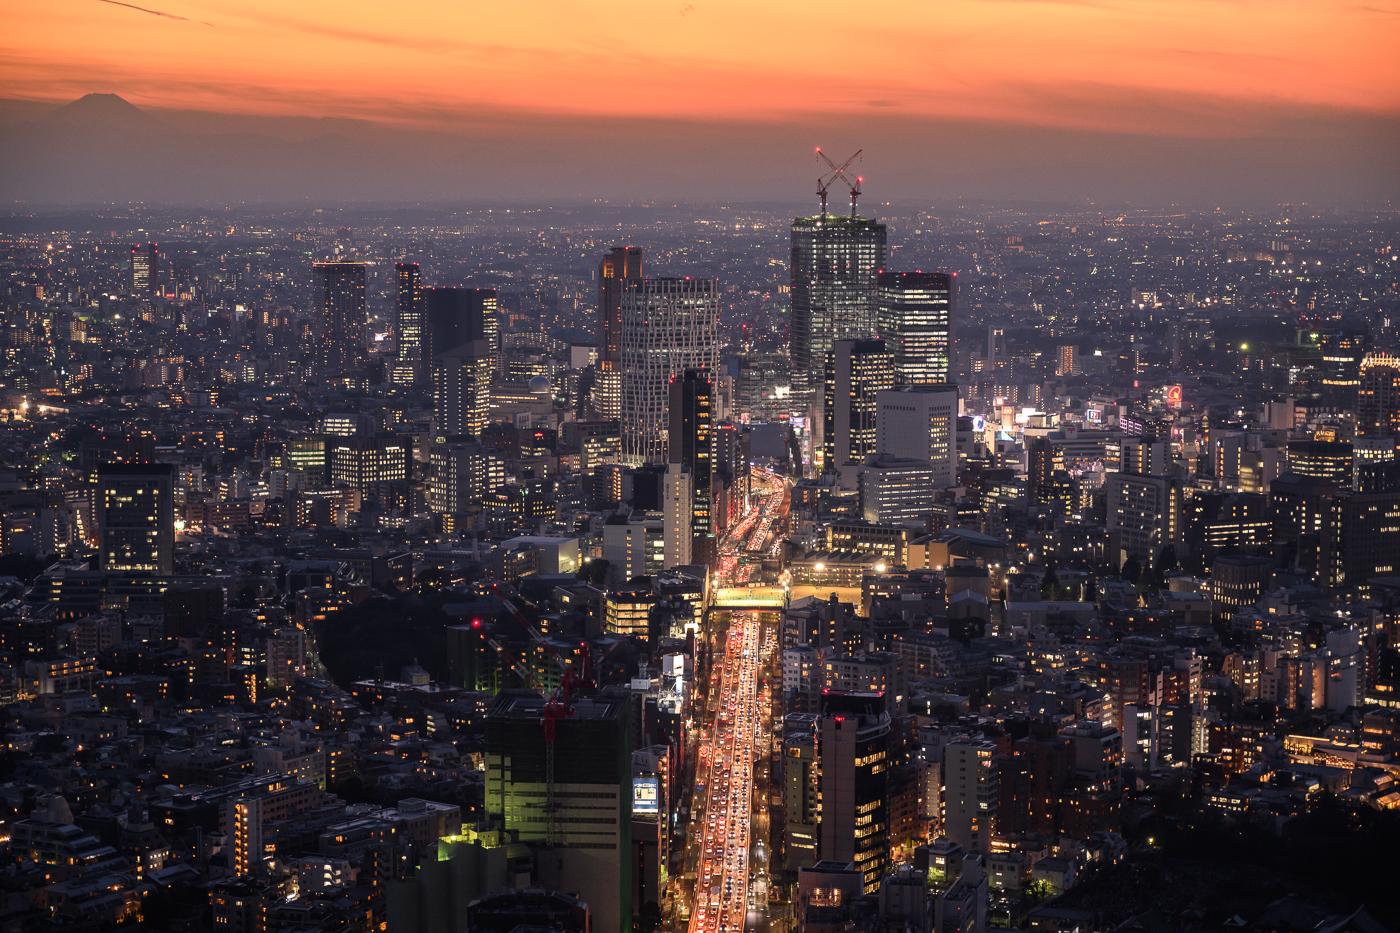 Shinjuku from Roppongi Hills